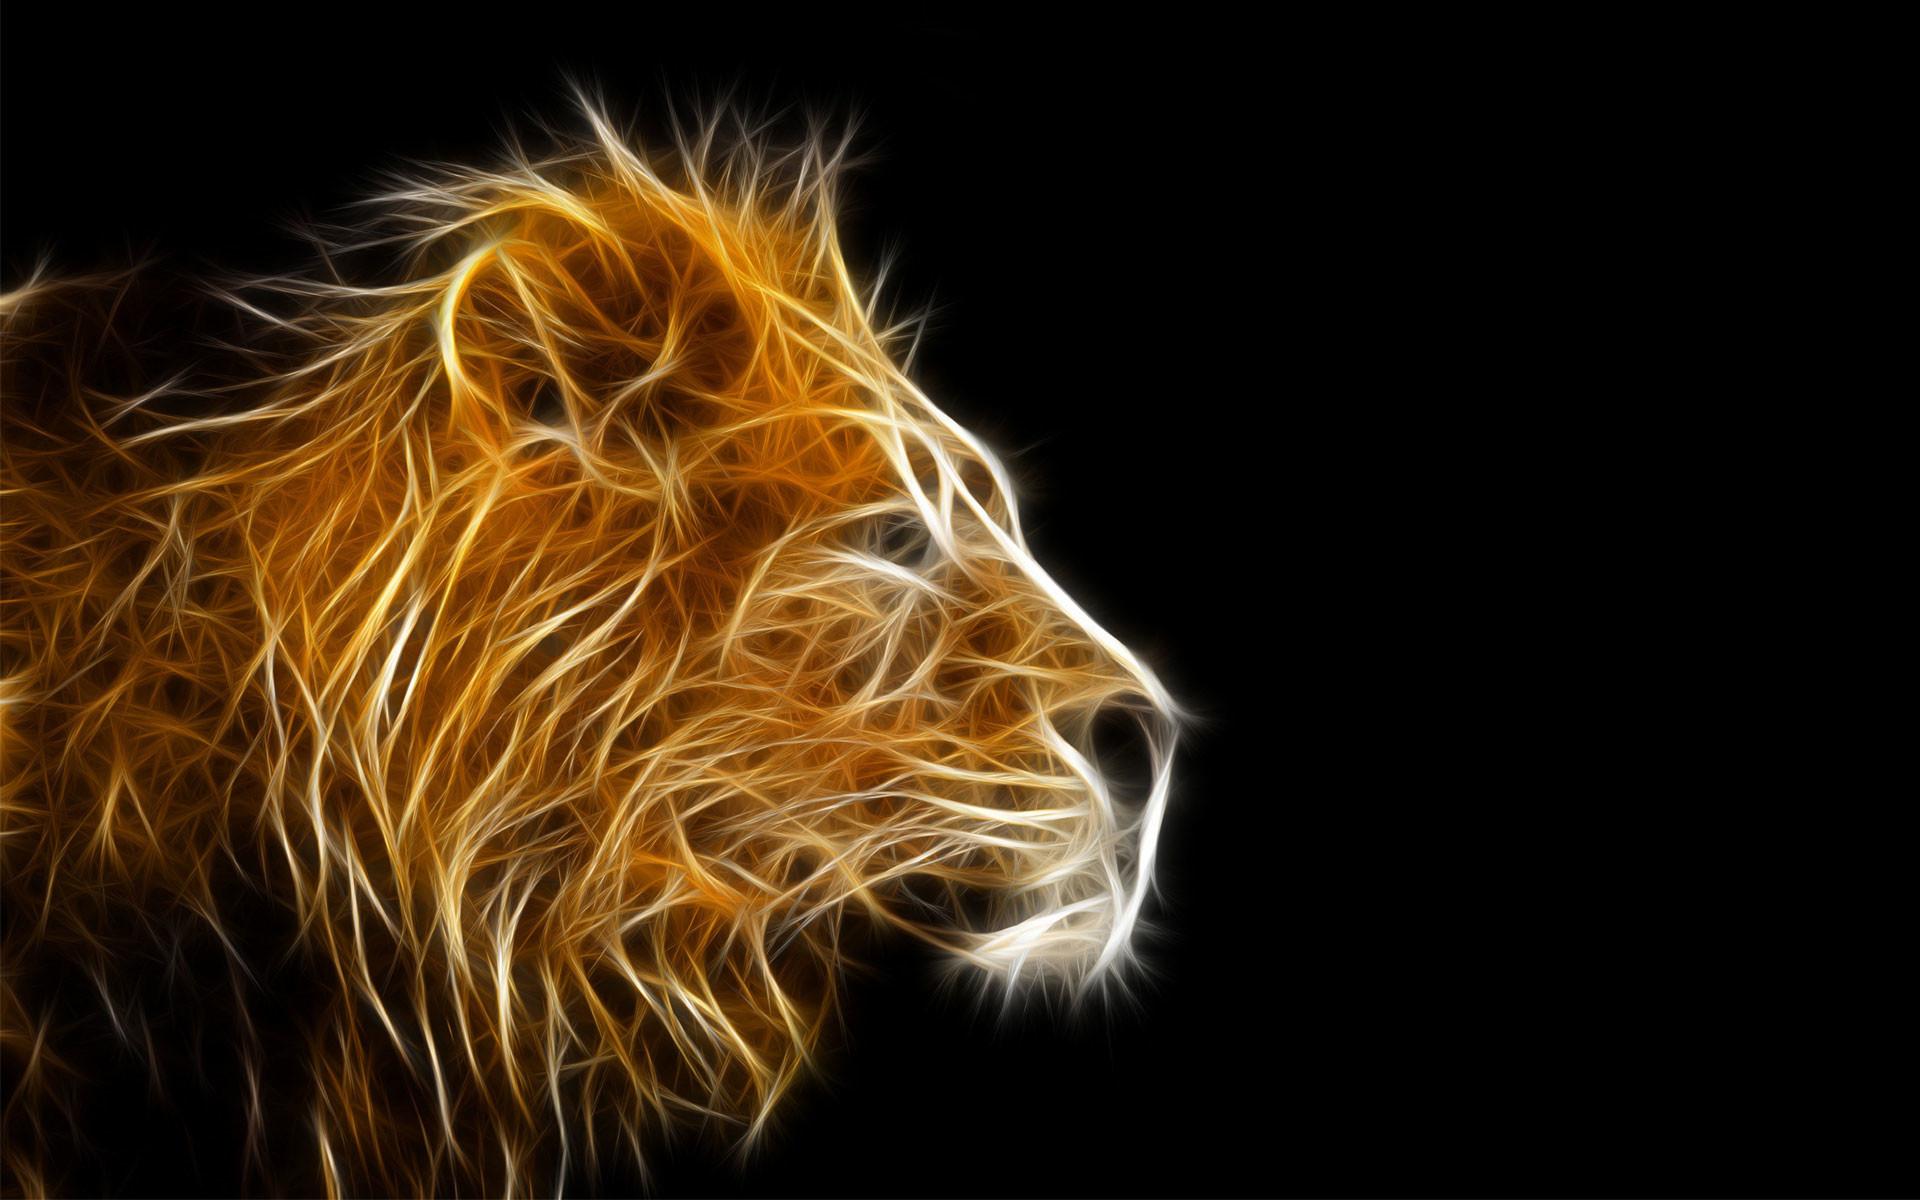 Fire Lion Wallpapers ·â' WallpaperTag